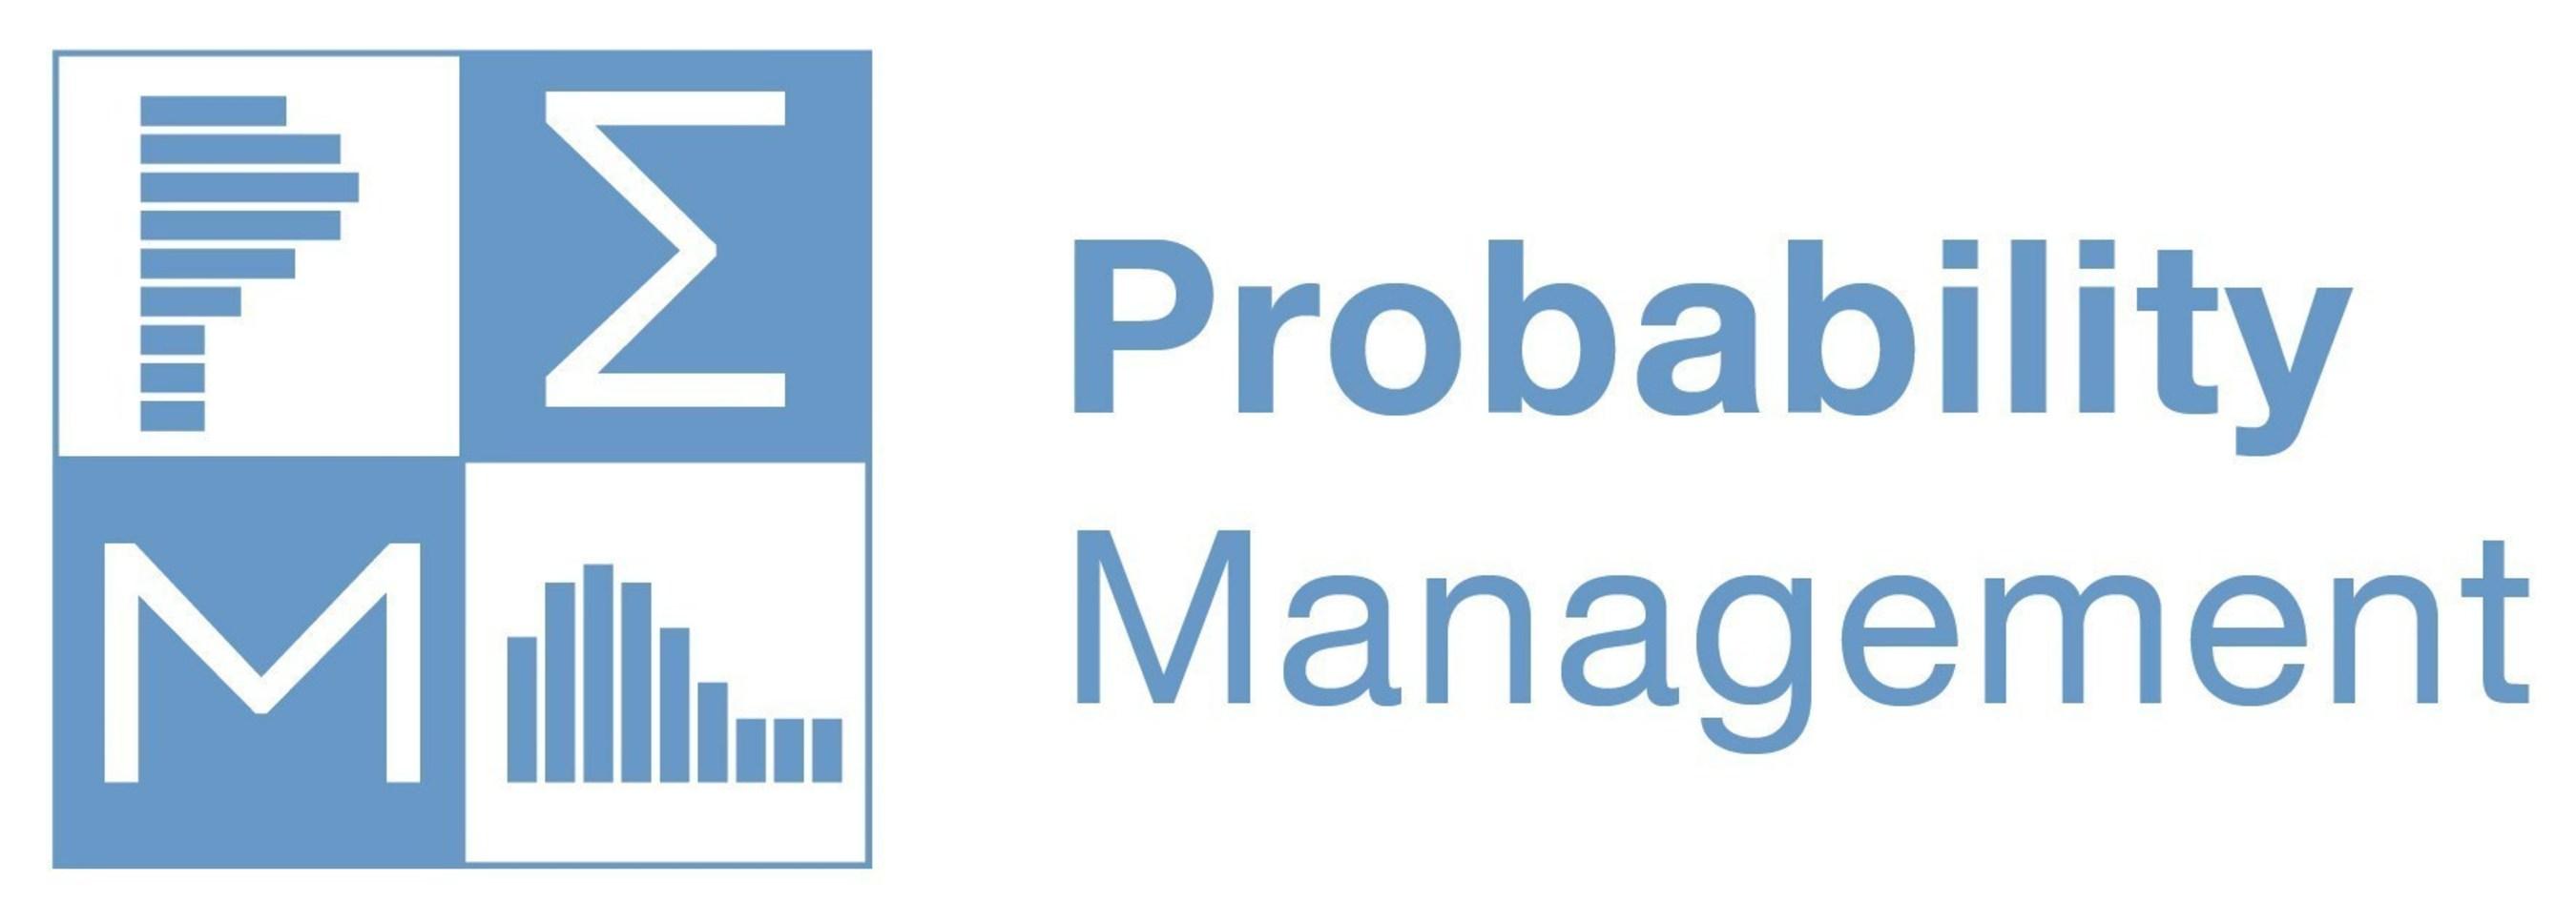 ProbabilityManagement.org